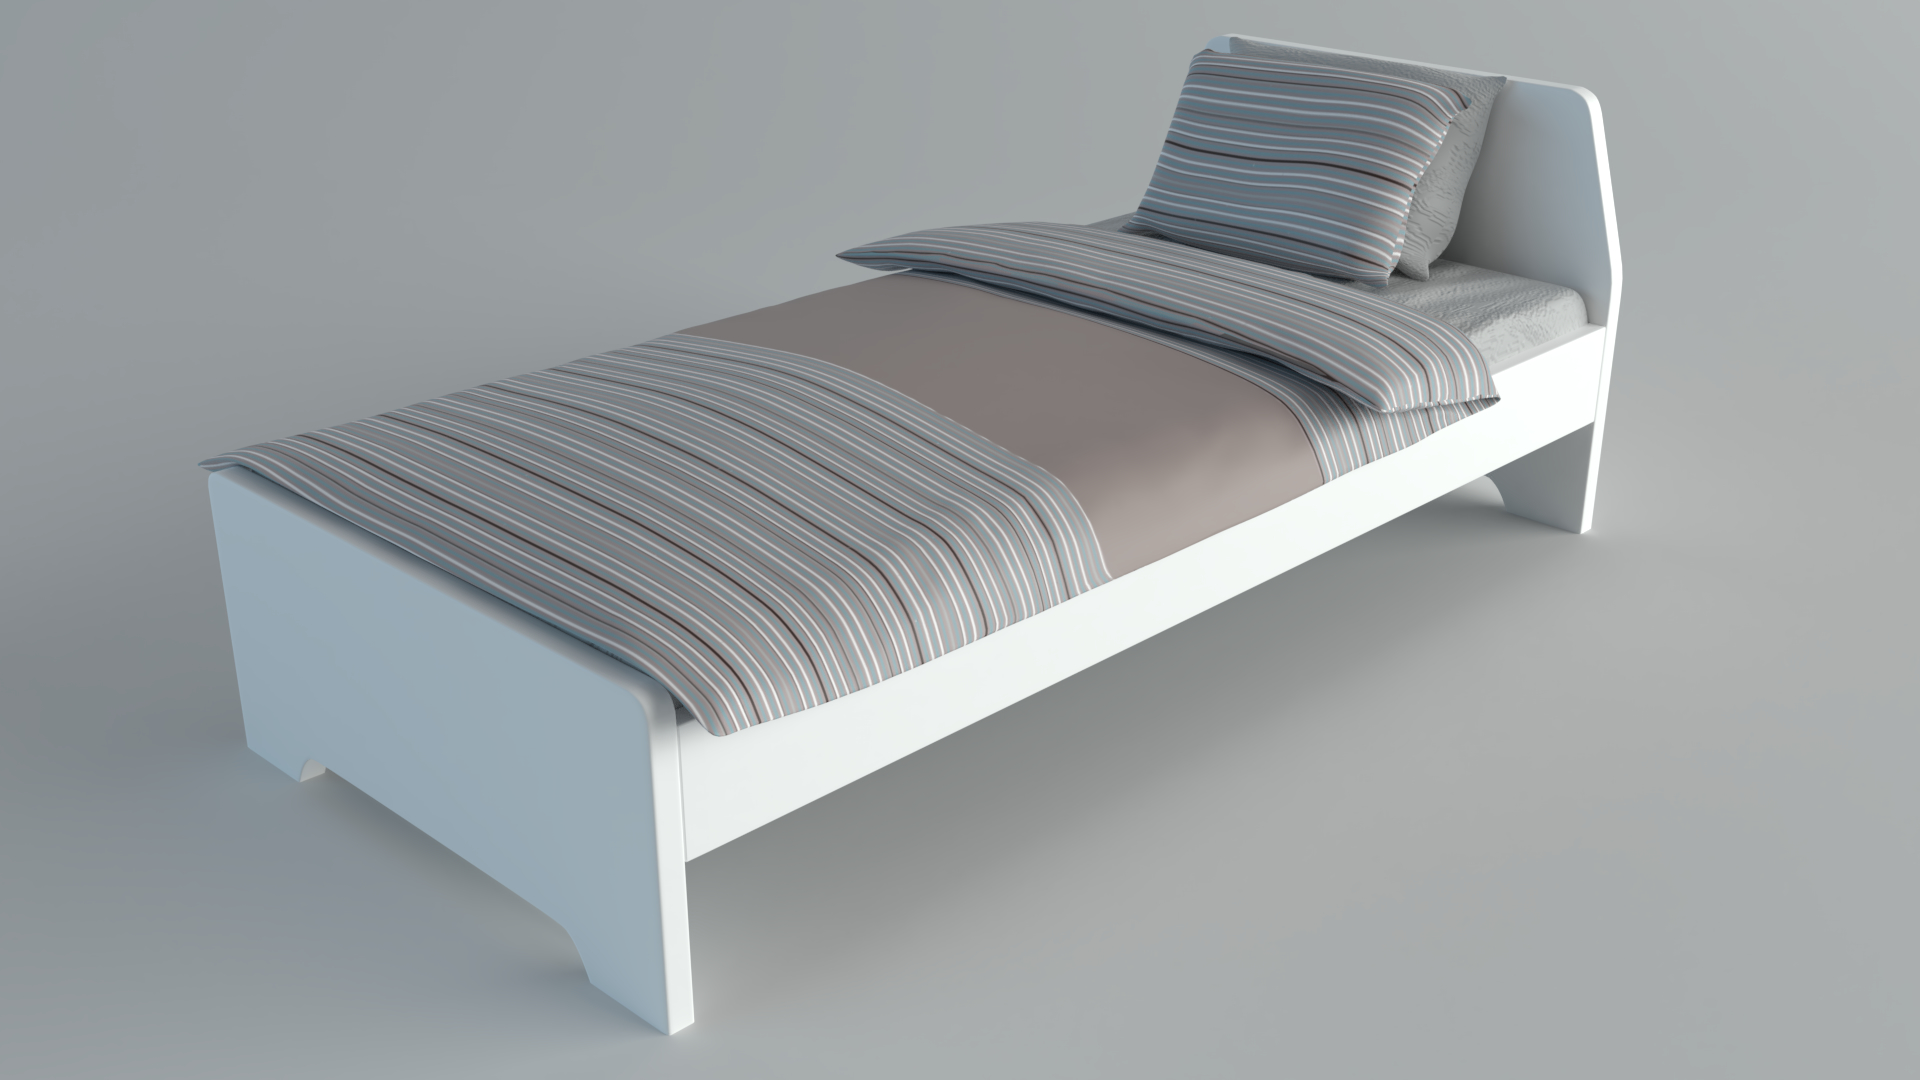 Einzelbett Ikea Askvoll 3d Modell Turbosquid 1370946